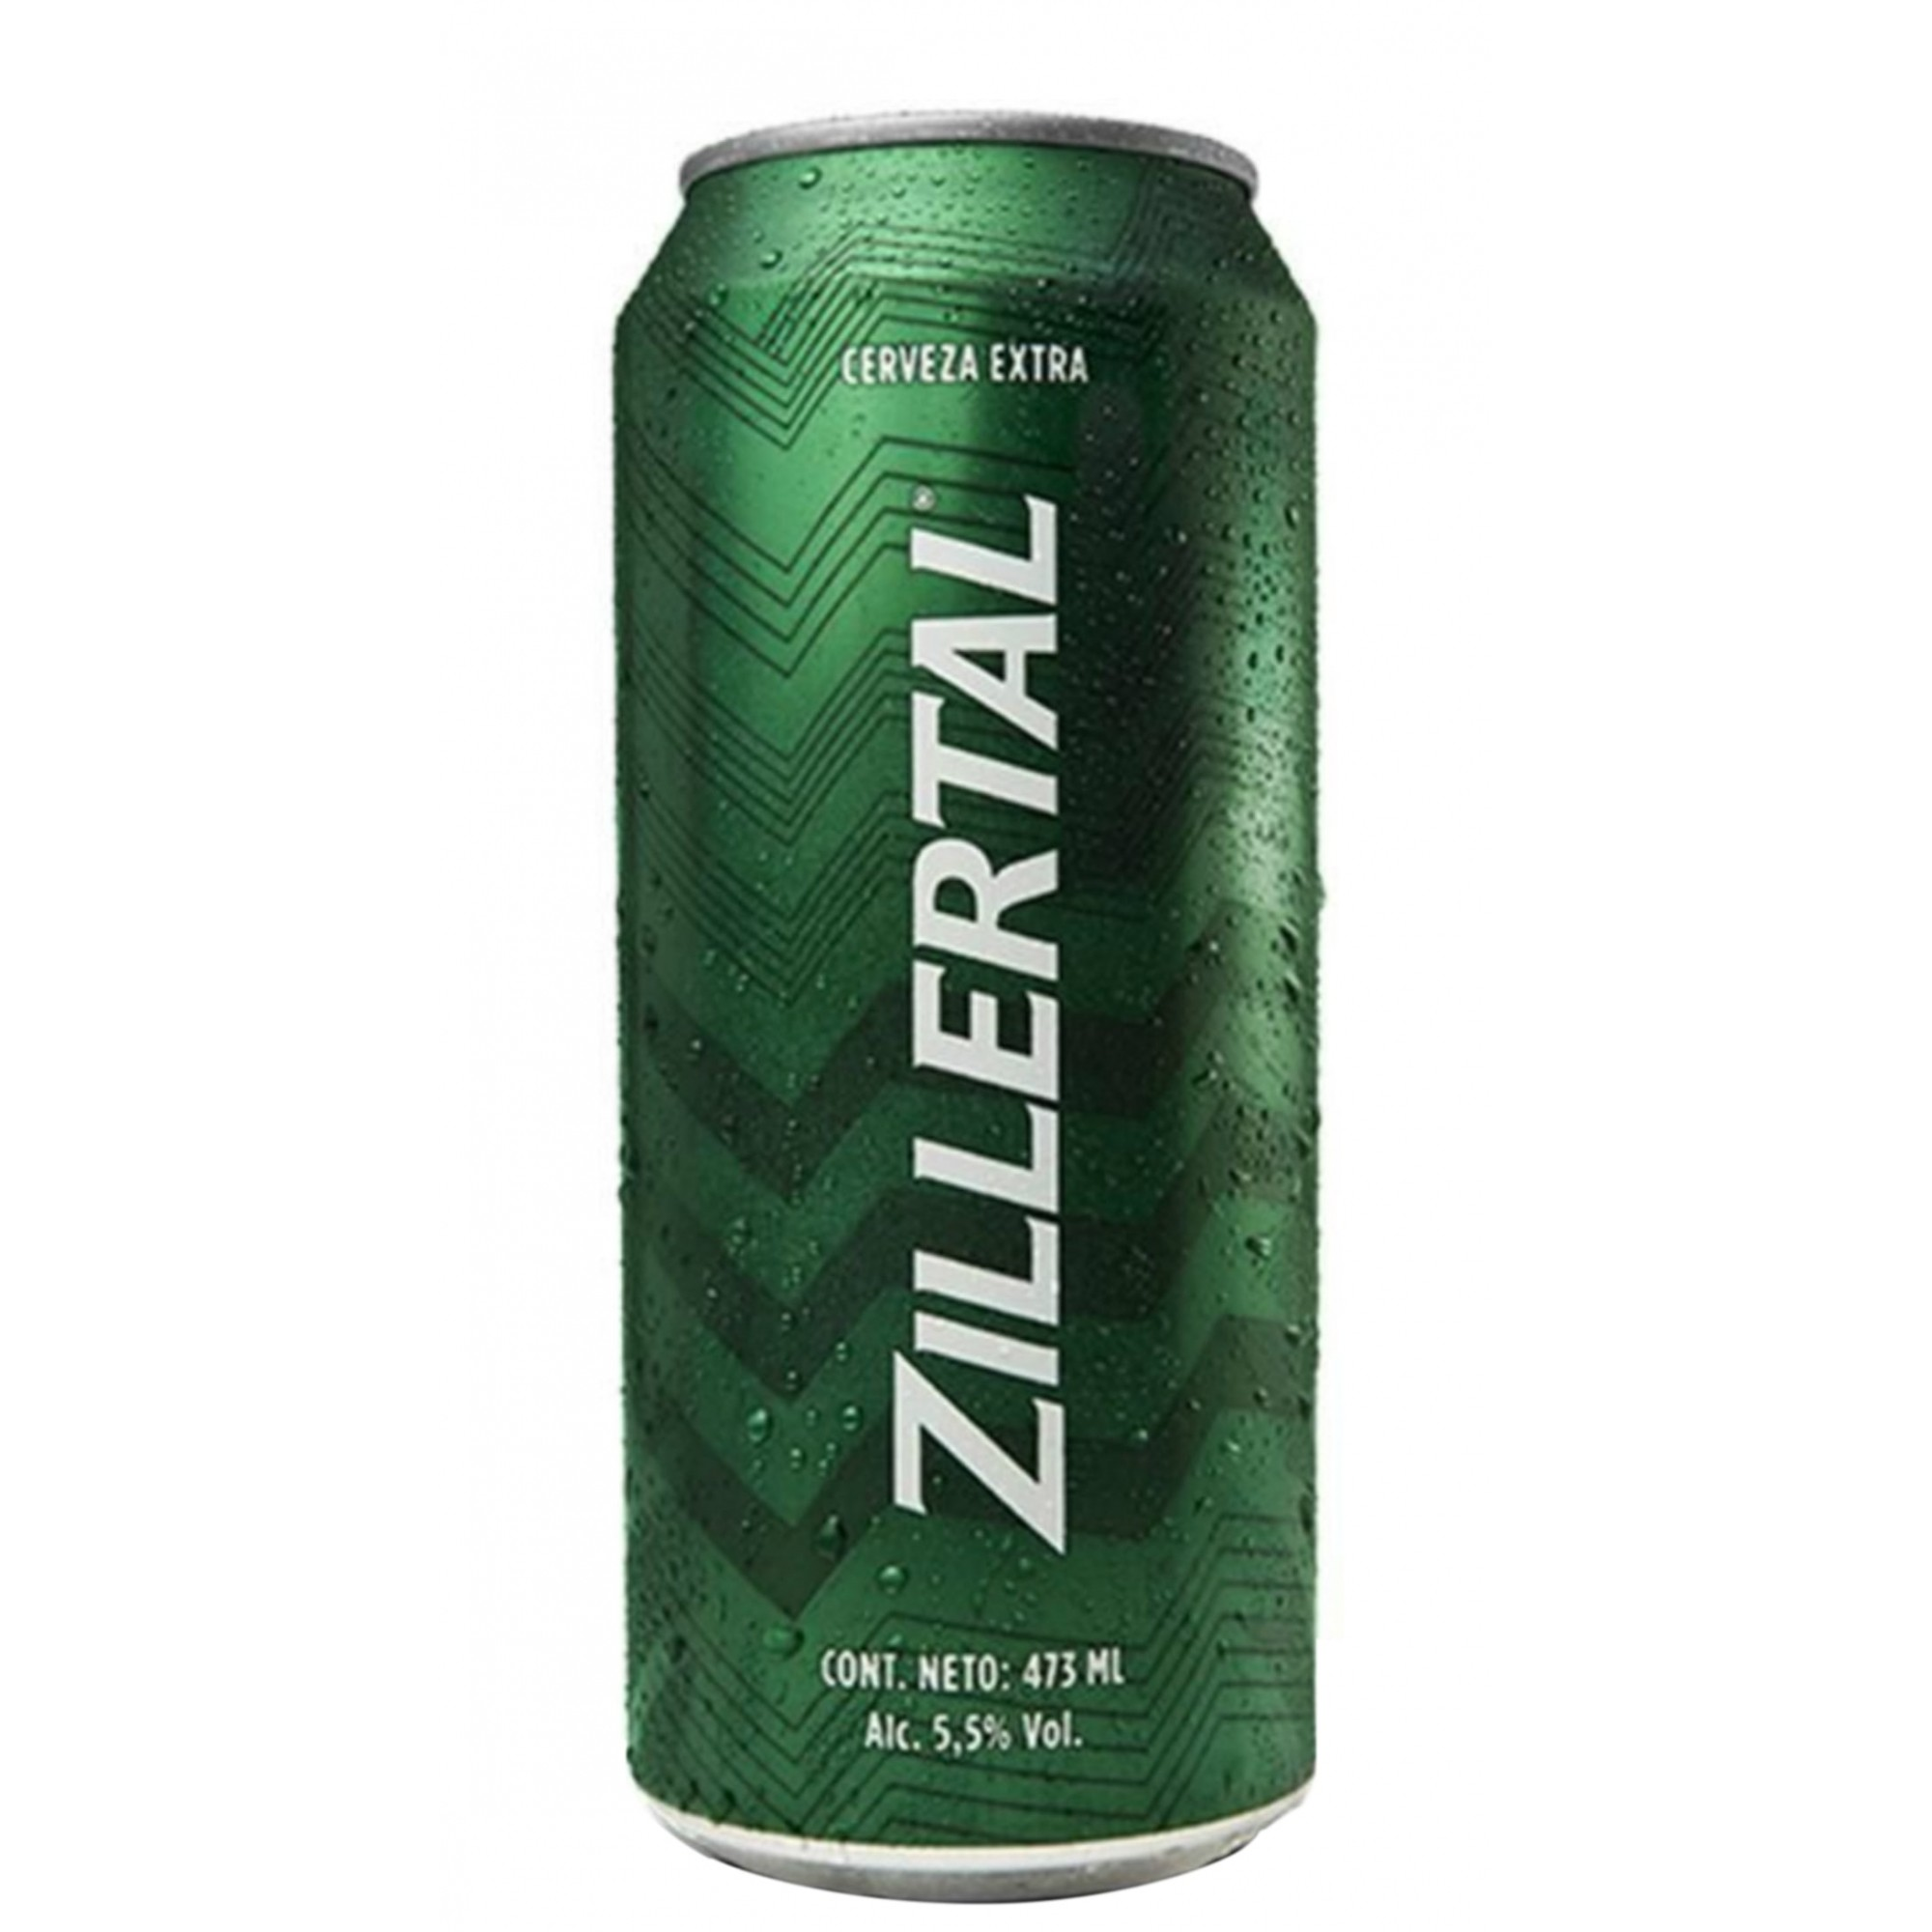 Zillertal Premium Lager Lata 473ml